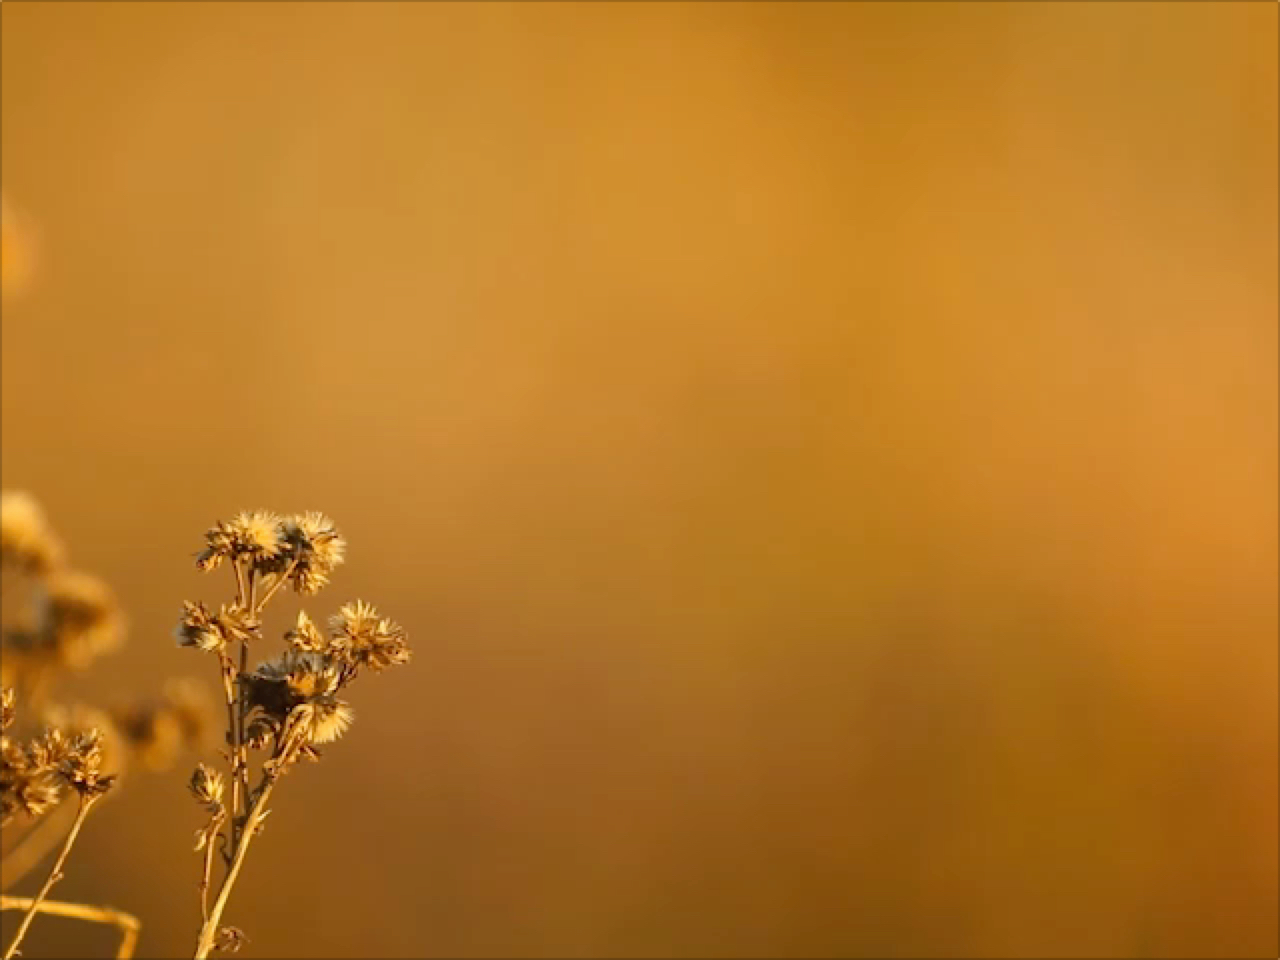 ORANGE DRY FLOWER WITH SHALLOW FOCUS